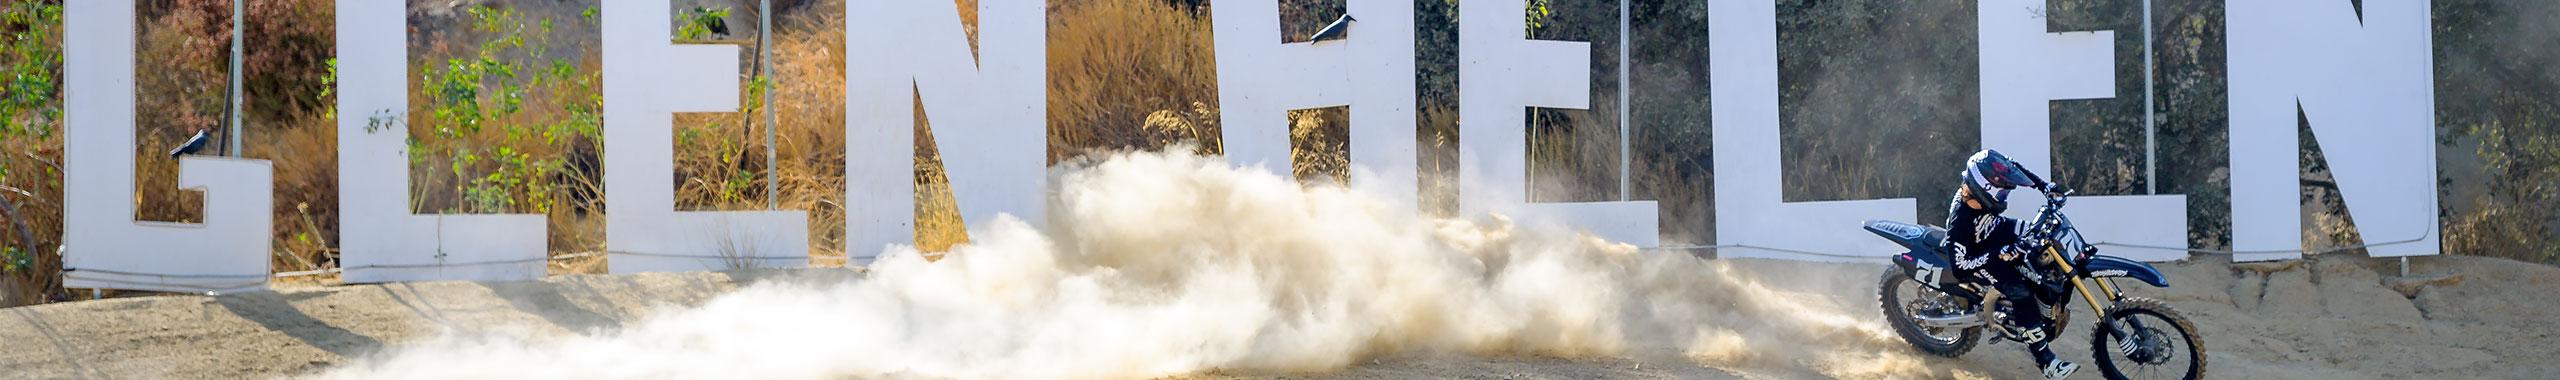 Moto-9 Flex Day in the Dirt 2020